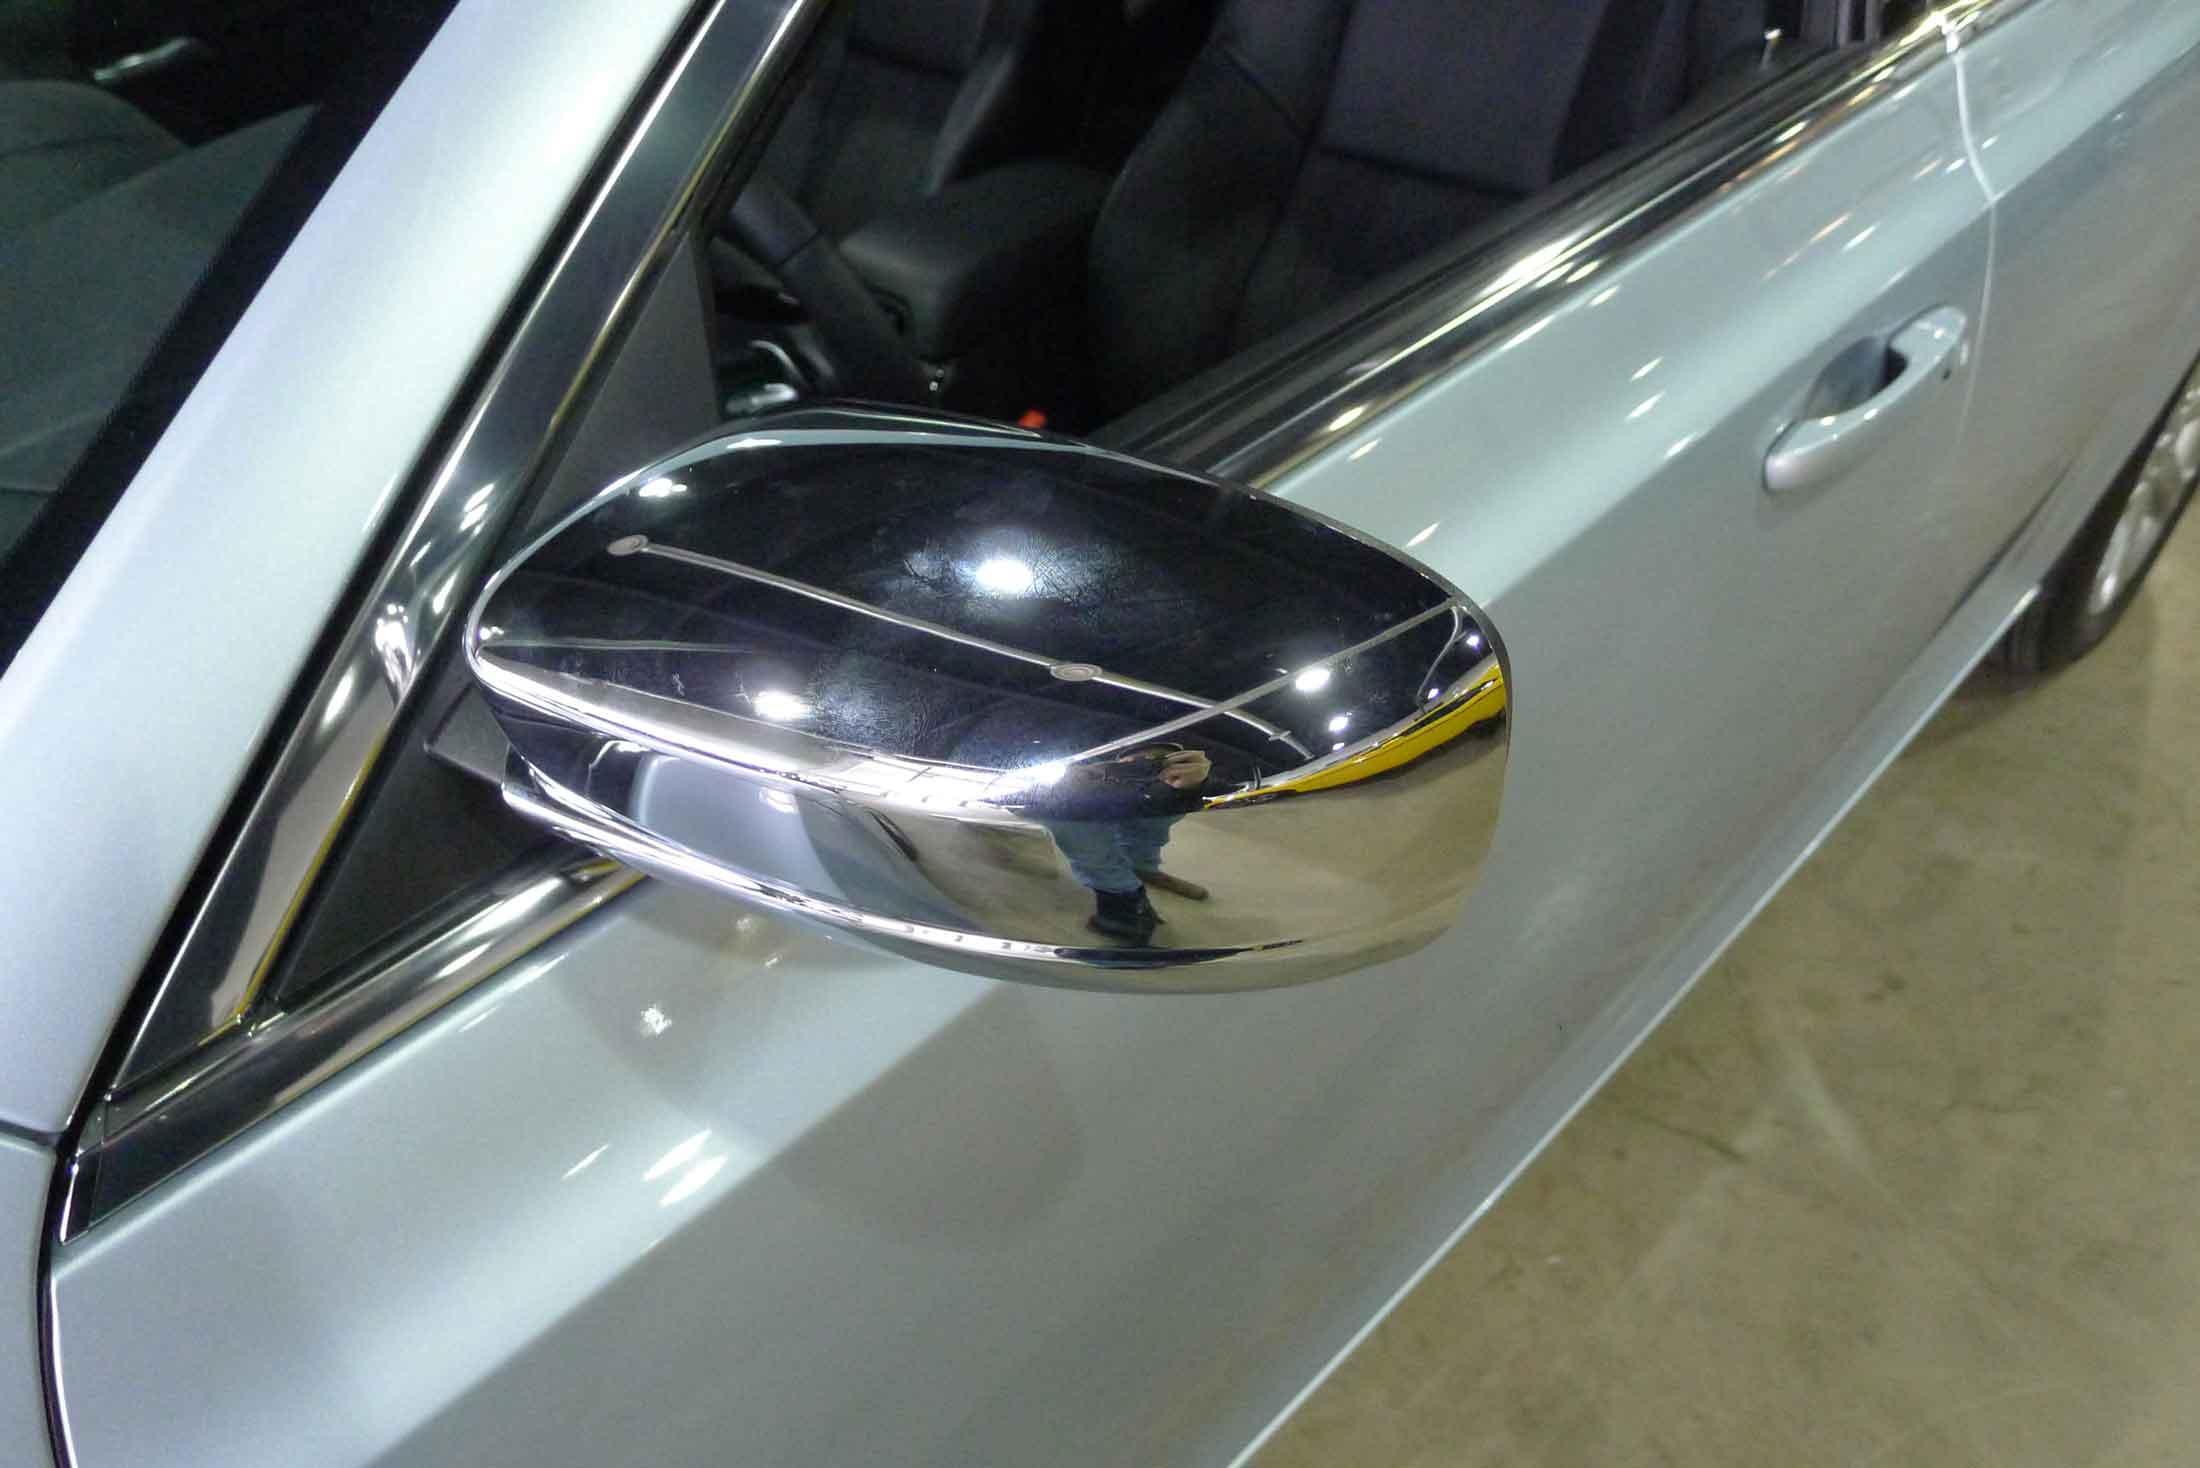 Chrysler 300 Chrome Door Handle / Mirror Cover Trim Package (2011-2016)